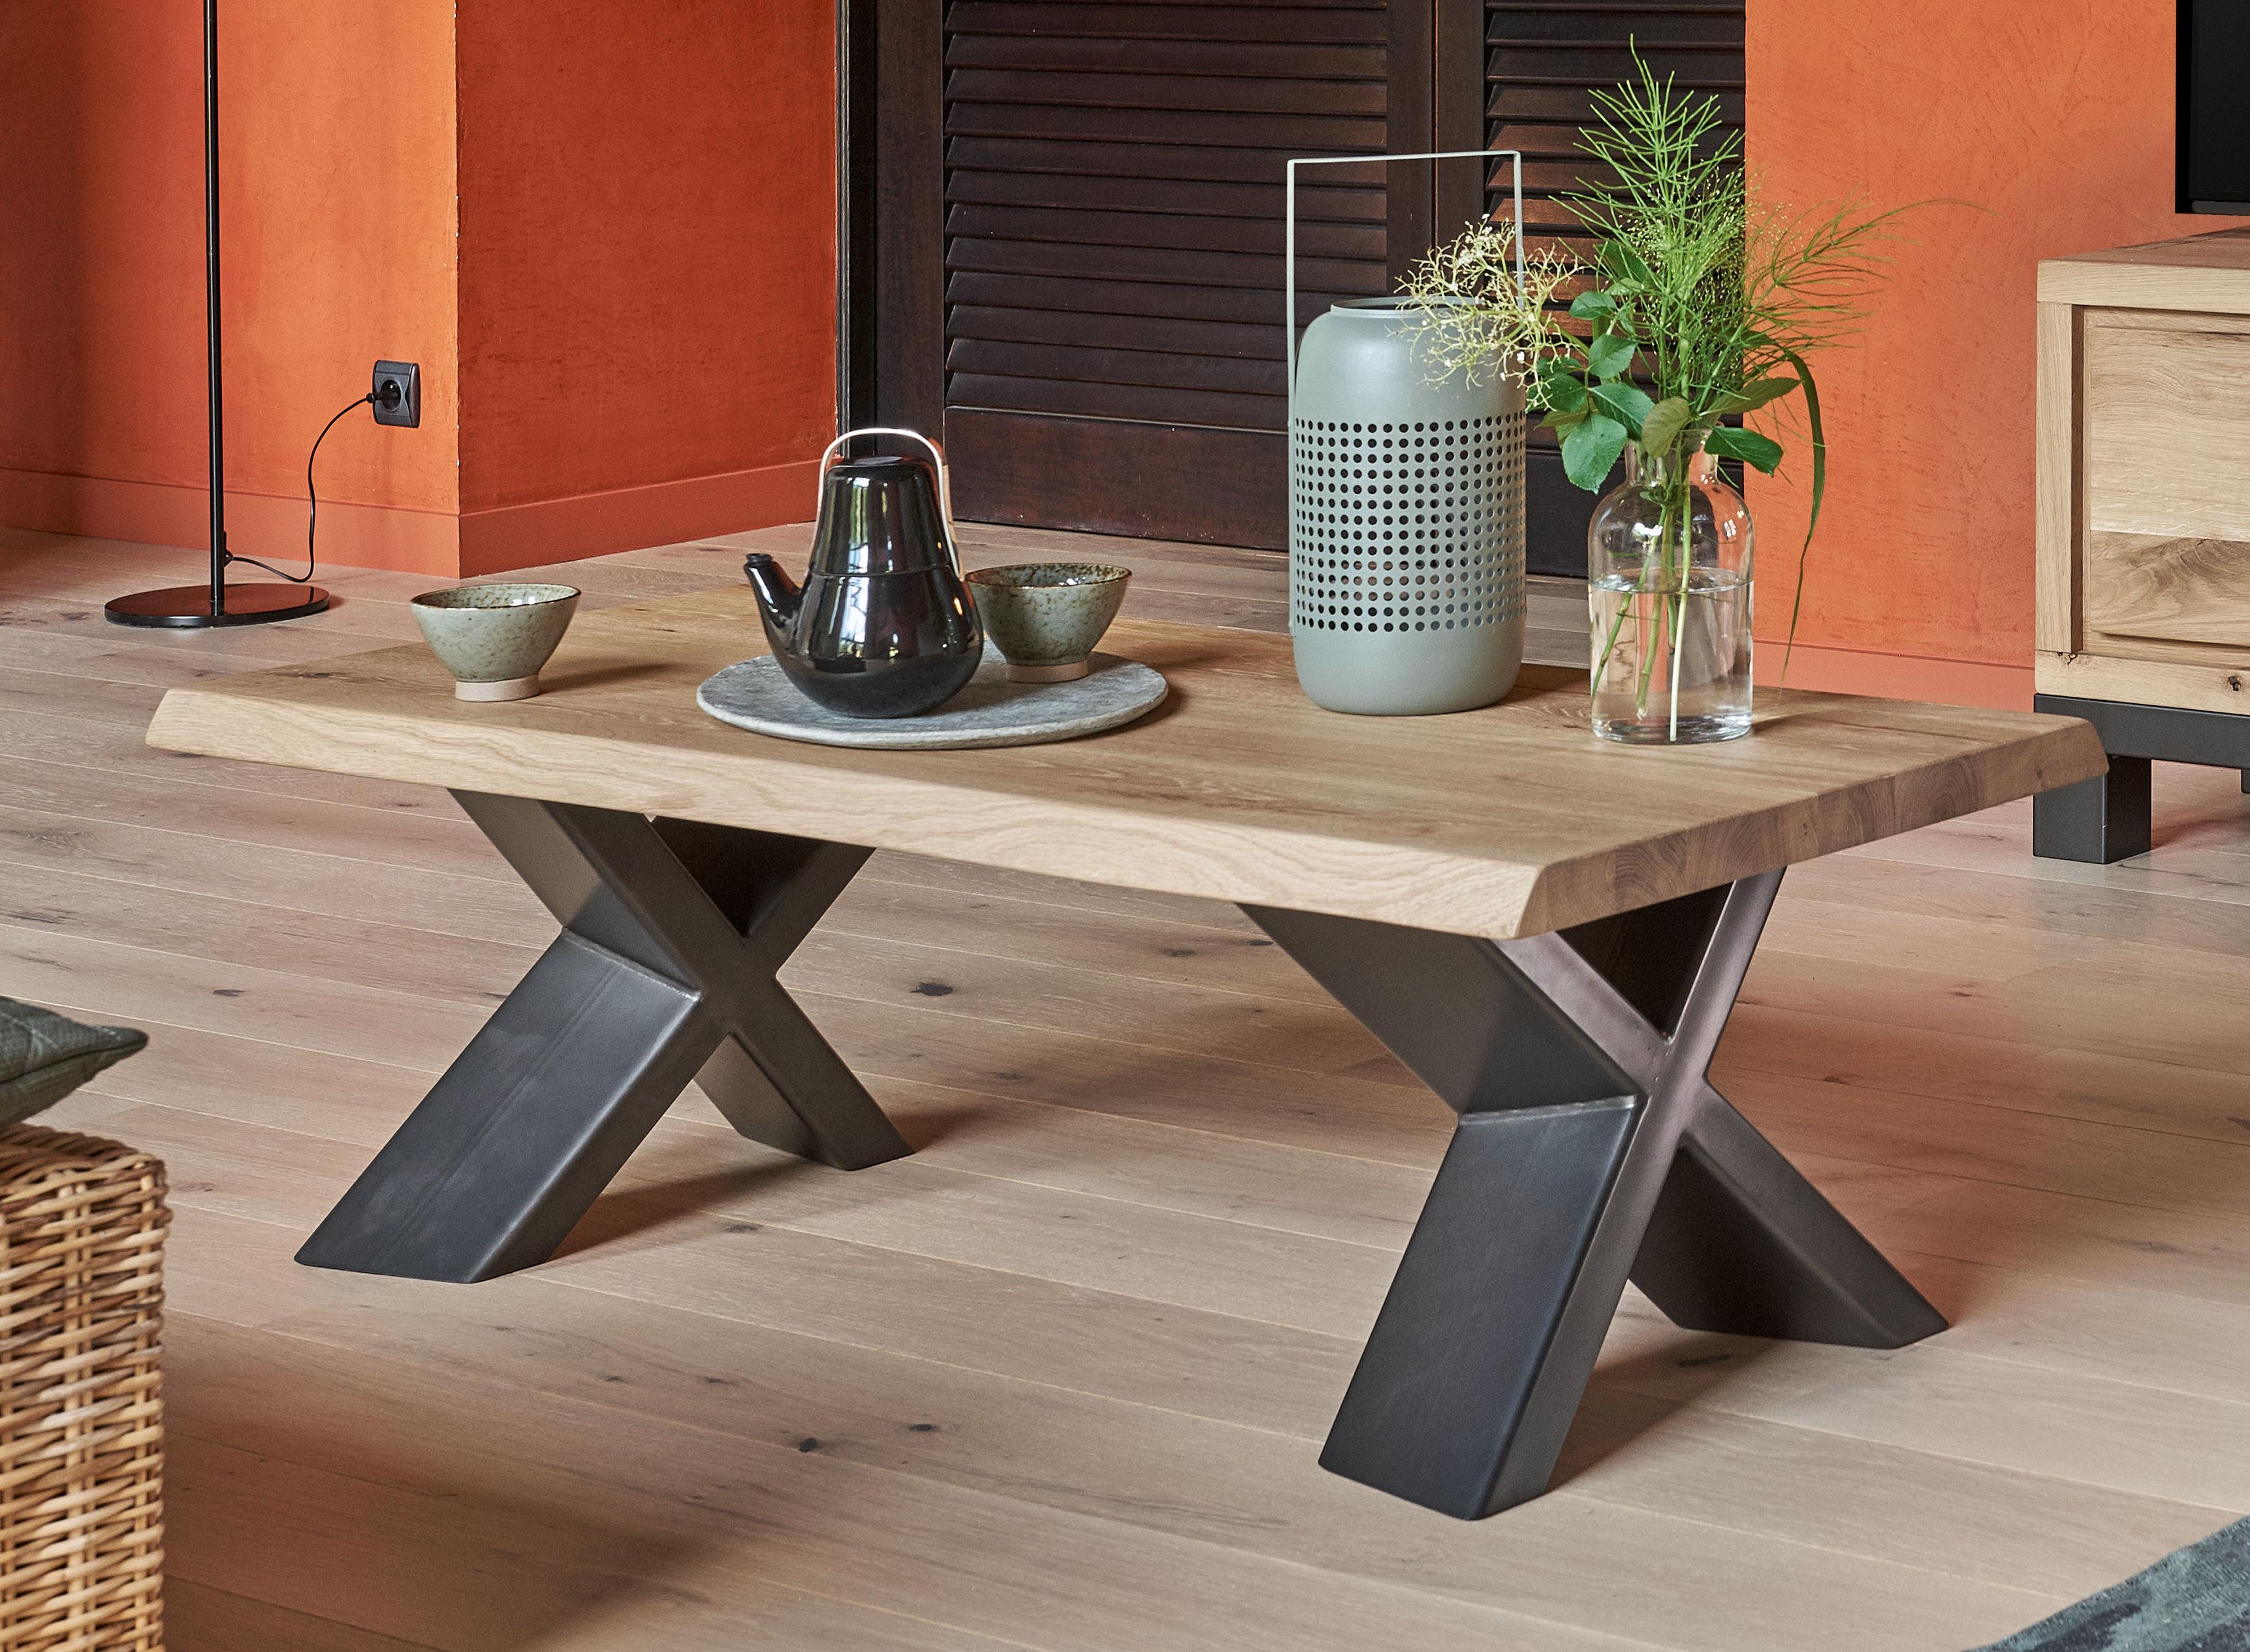 Table basse rectangulaire bois naturel et metal type